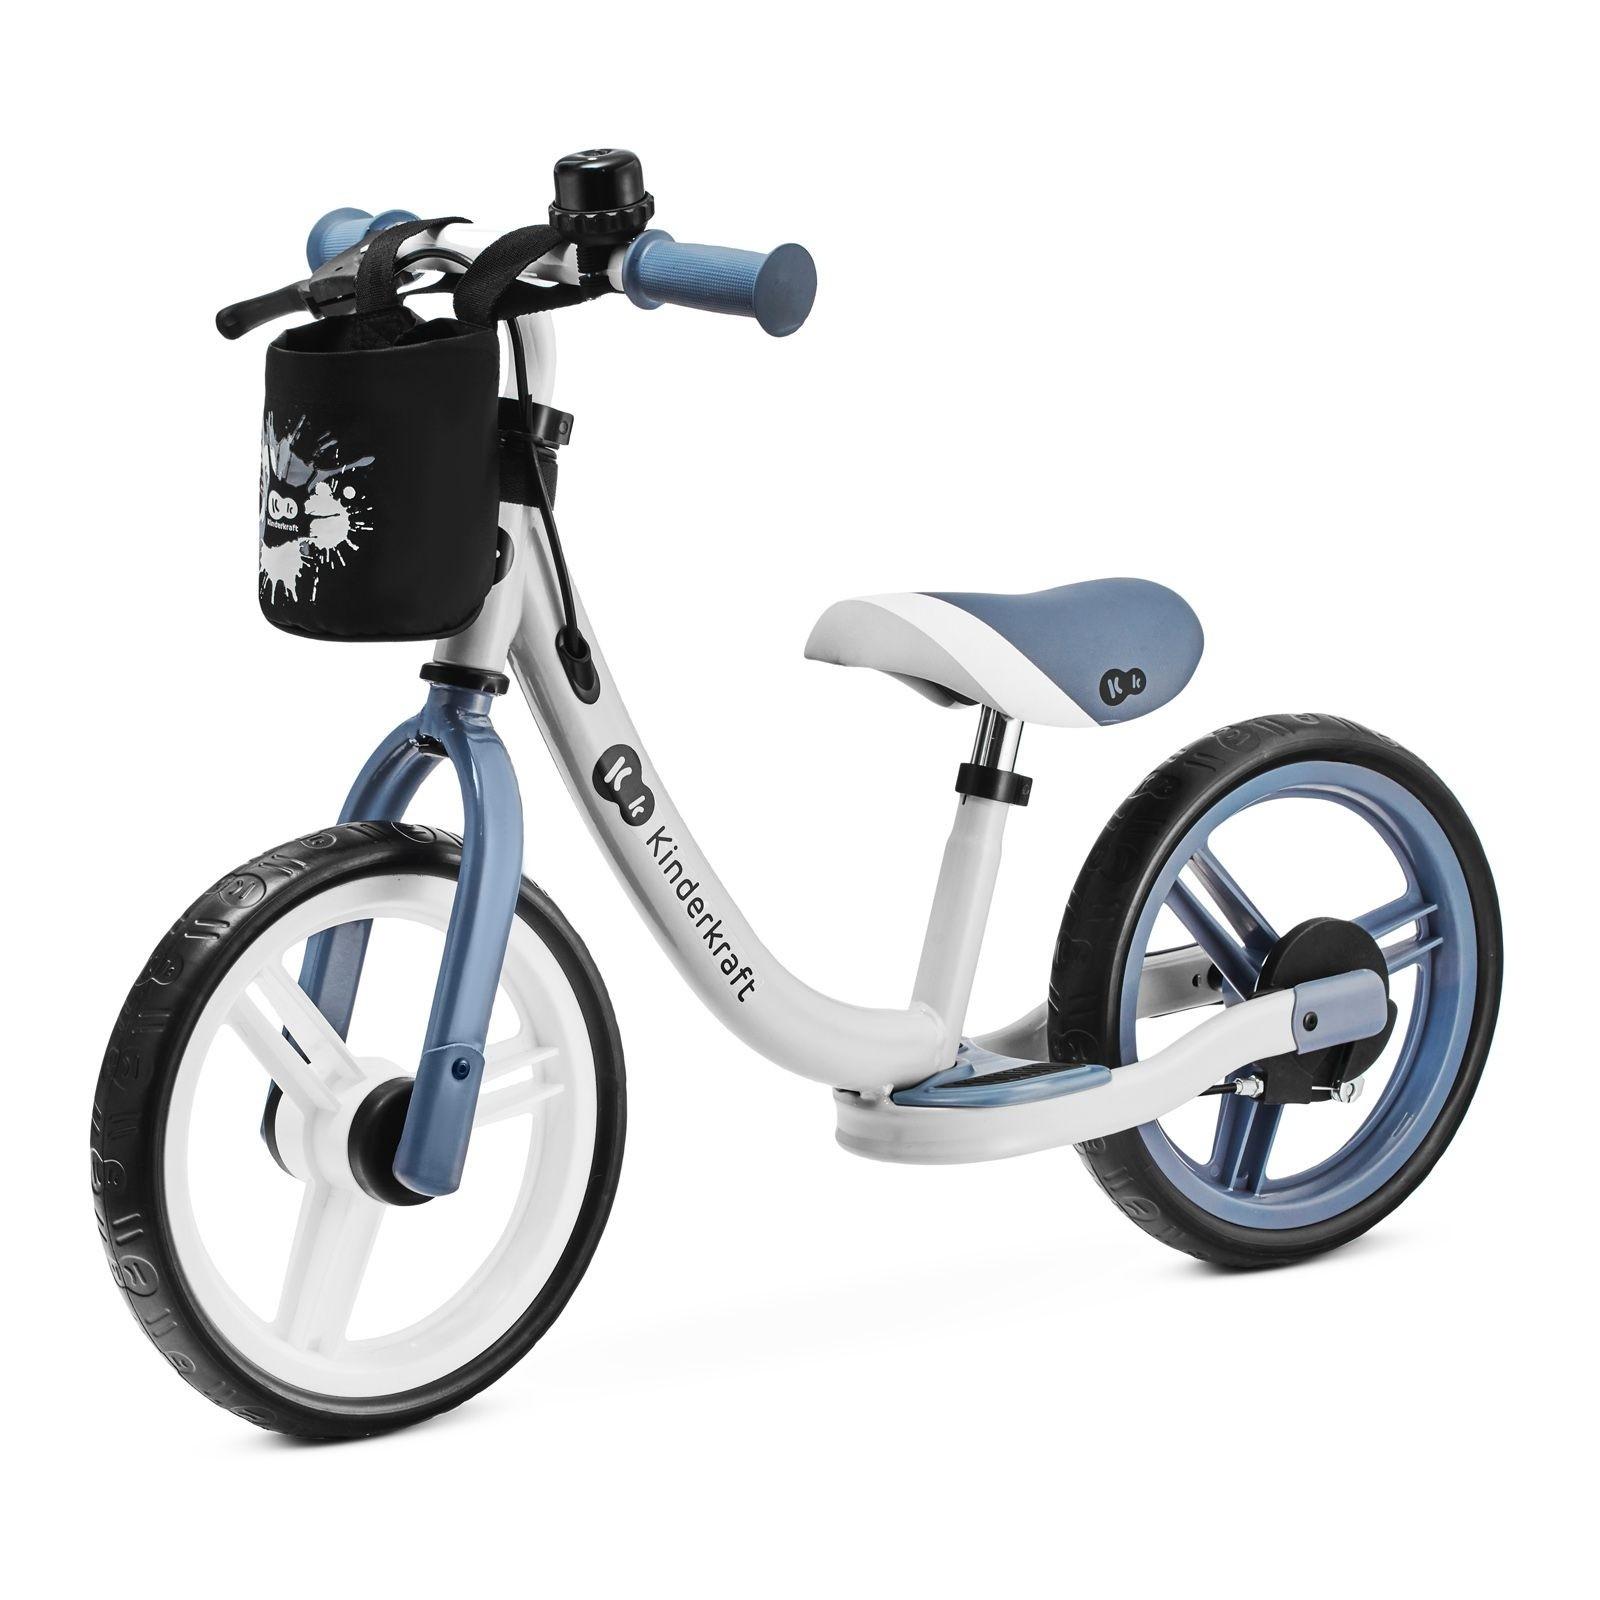 Balans bicikl Kinderkraft SPACE 2021 saphire blue